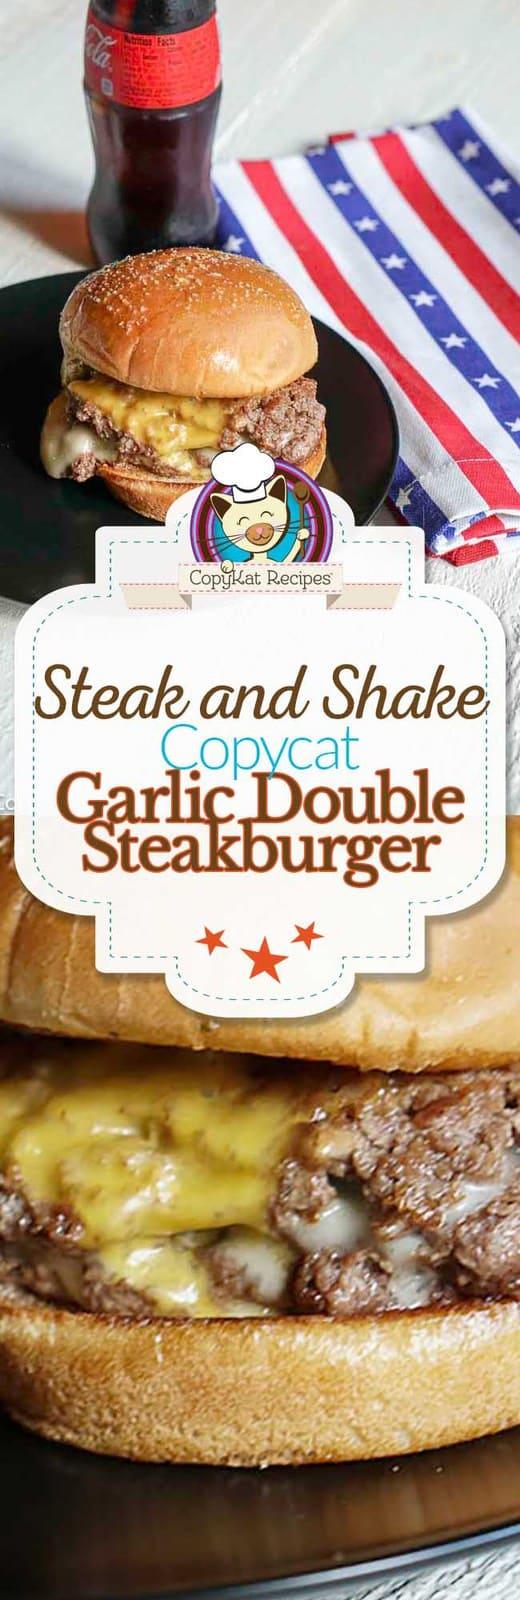 Copycat Steak And Shake Garlic Double Steakburger